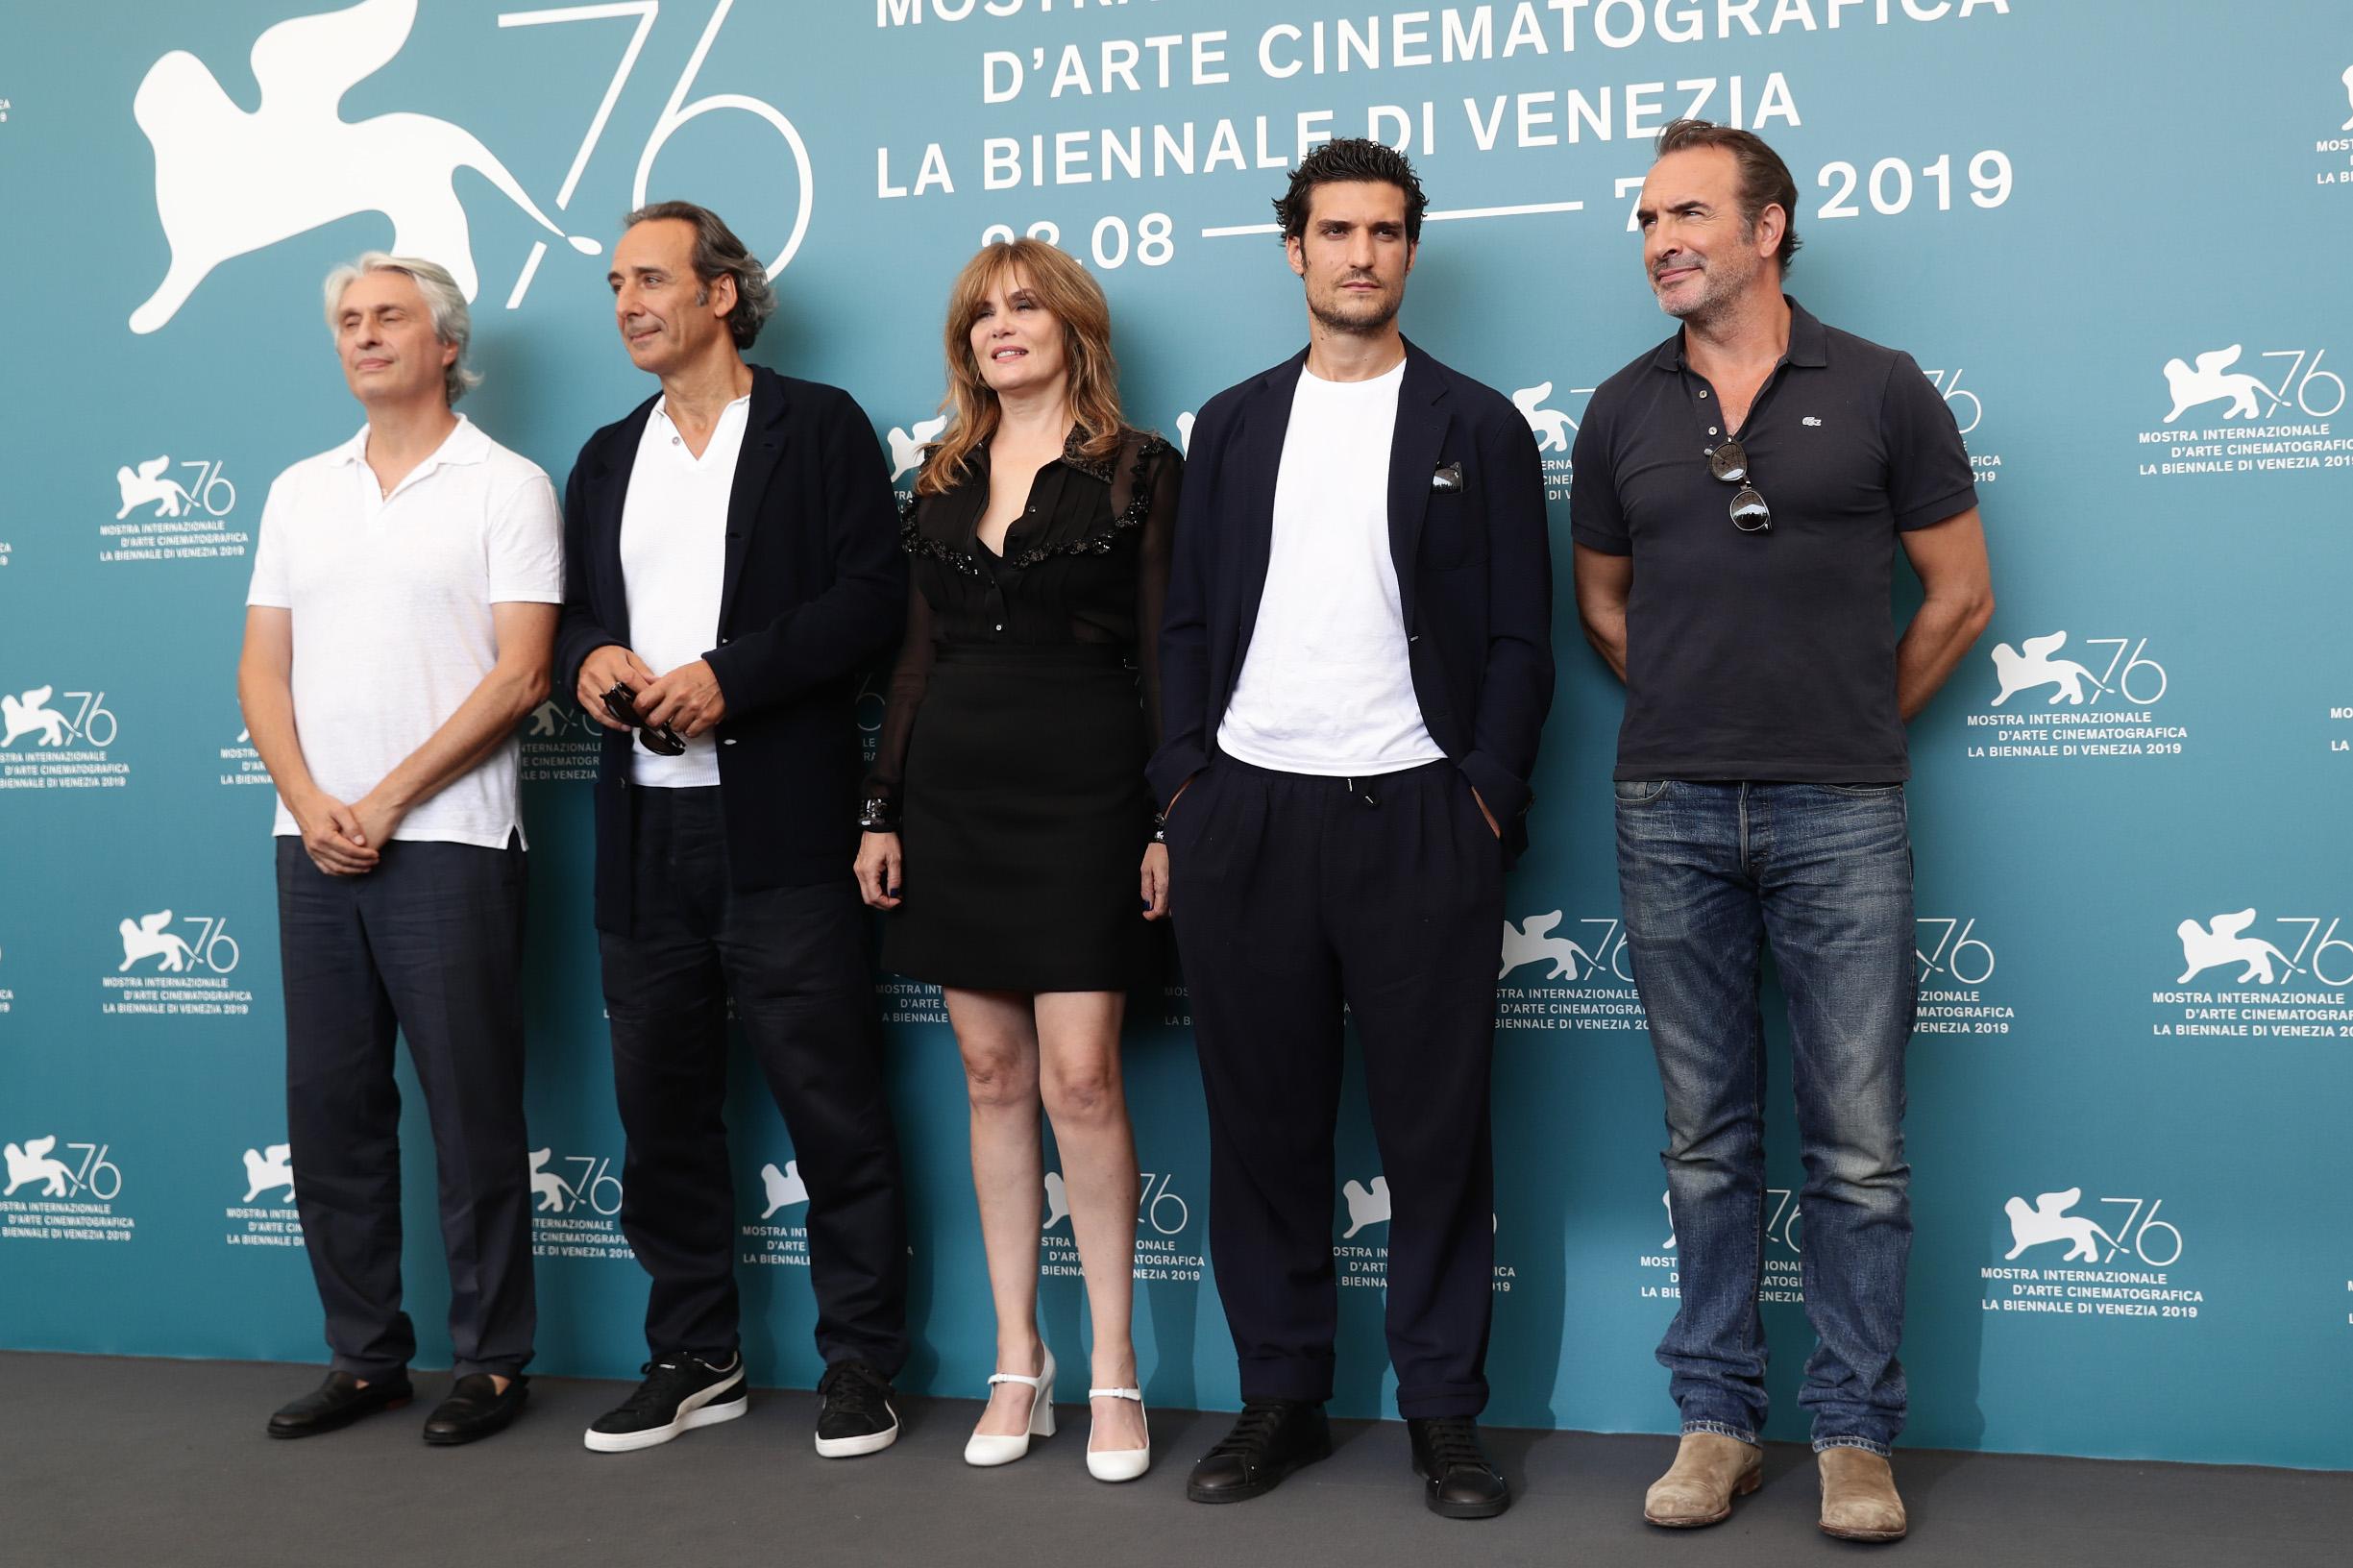 VENICE, ITALY - AUGUST 30: (L-R) Alain Goldman, Alexandre Desplat, Louis Garrel,  Emmanuelle Seigner and Jean Dujardin attend